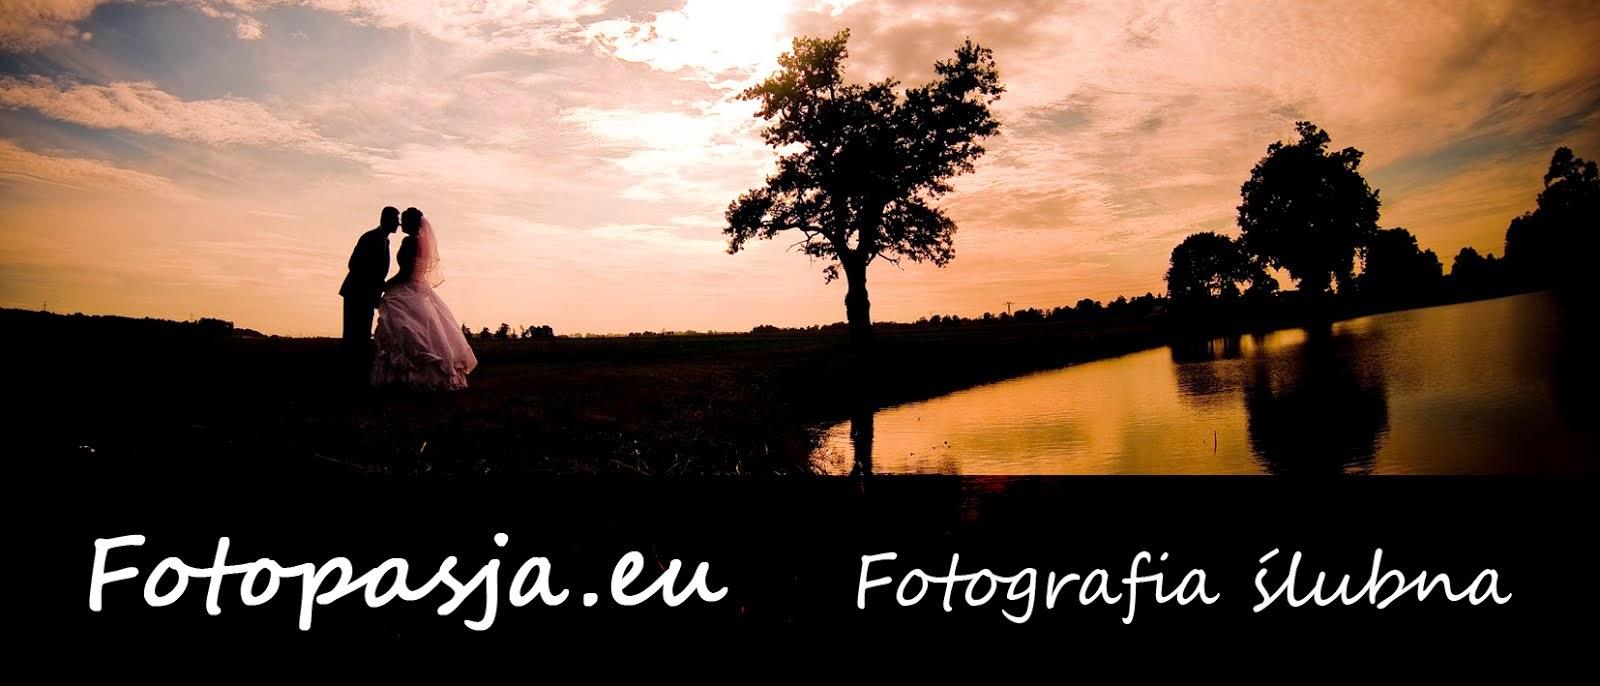 Fotopasja